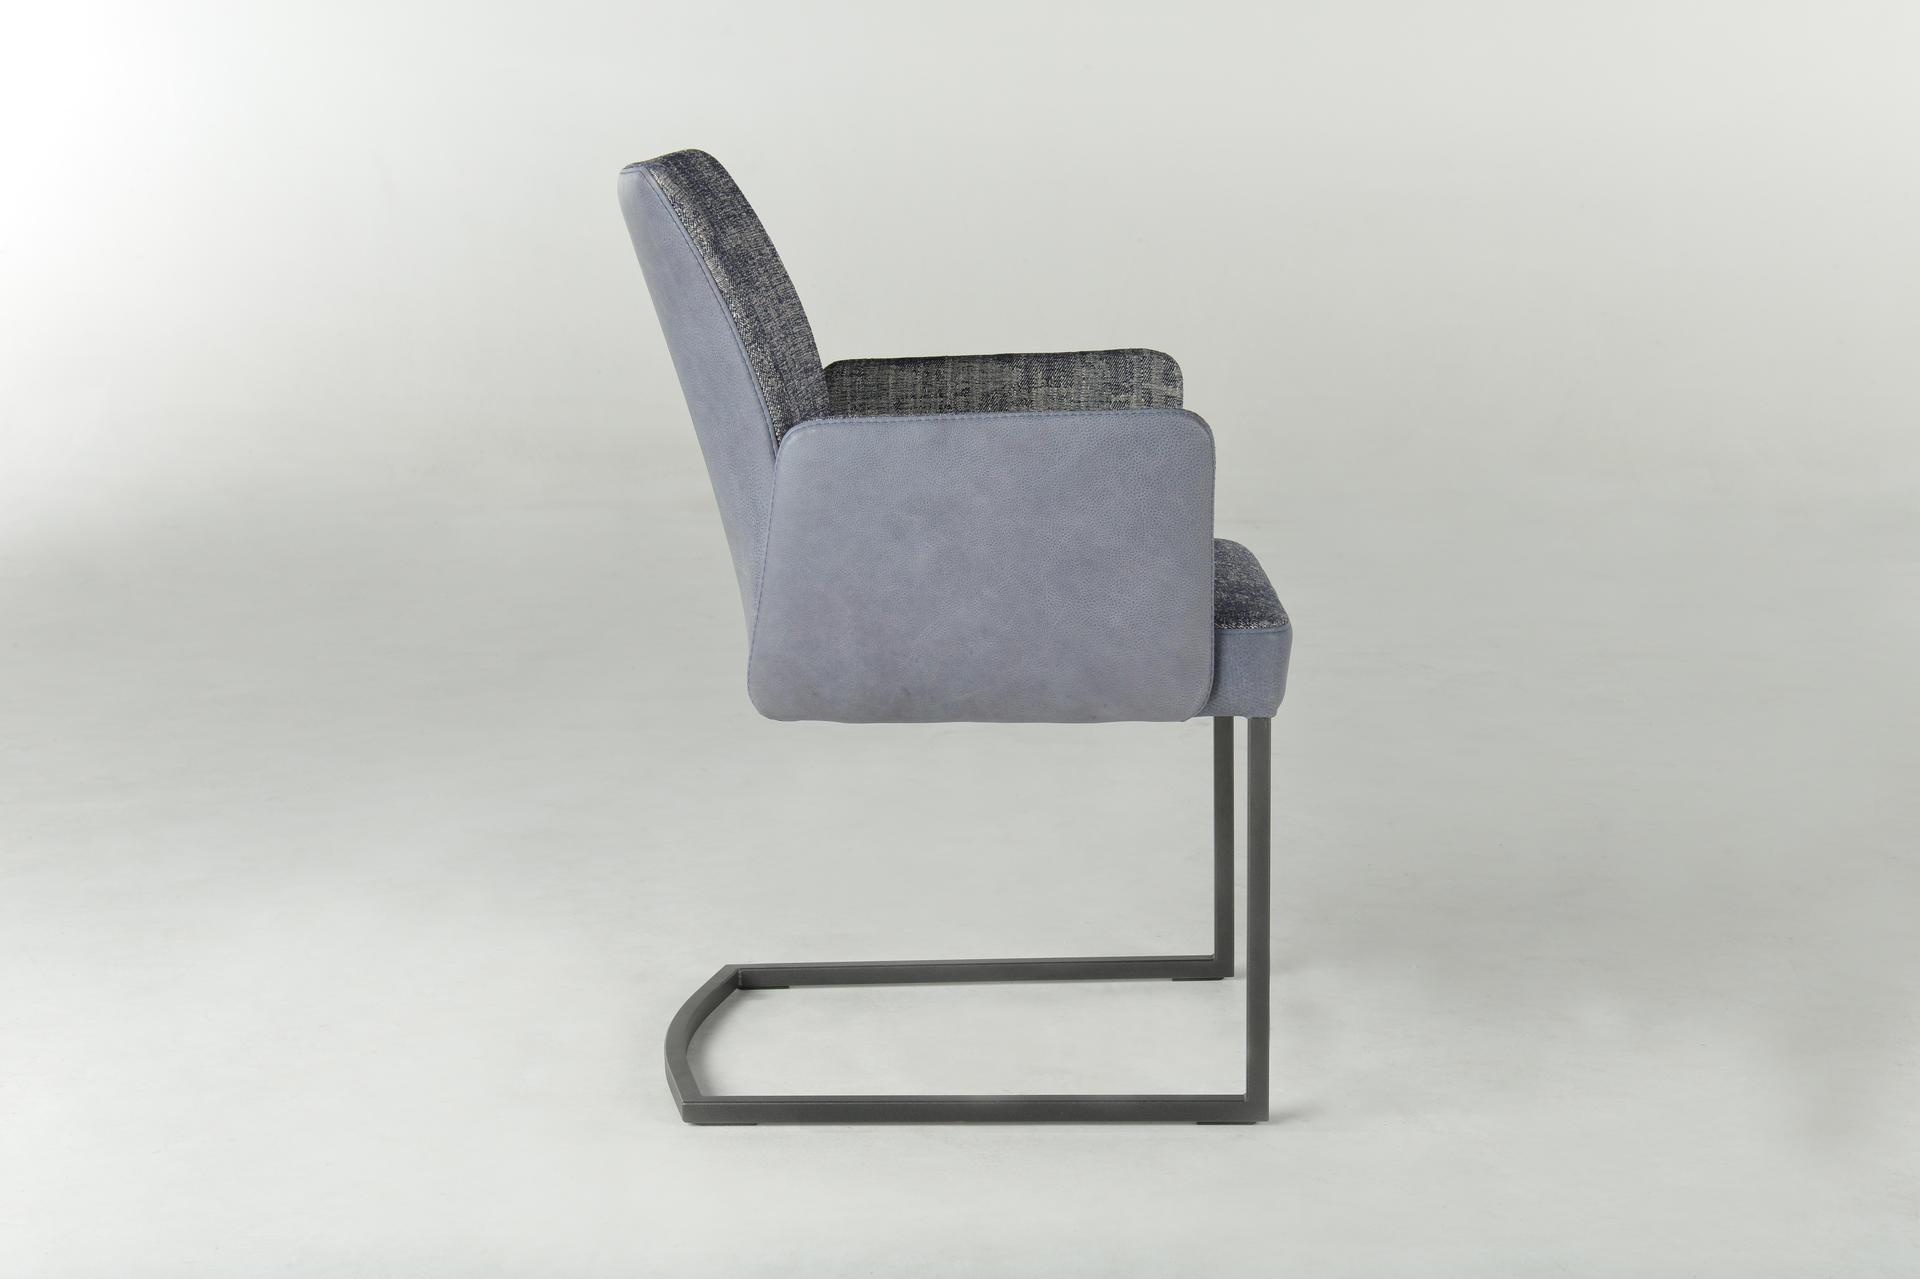 стул Ultimo, Bert Plantagie, фото 5